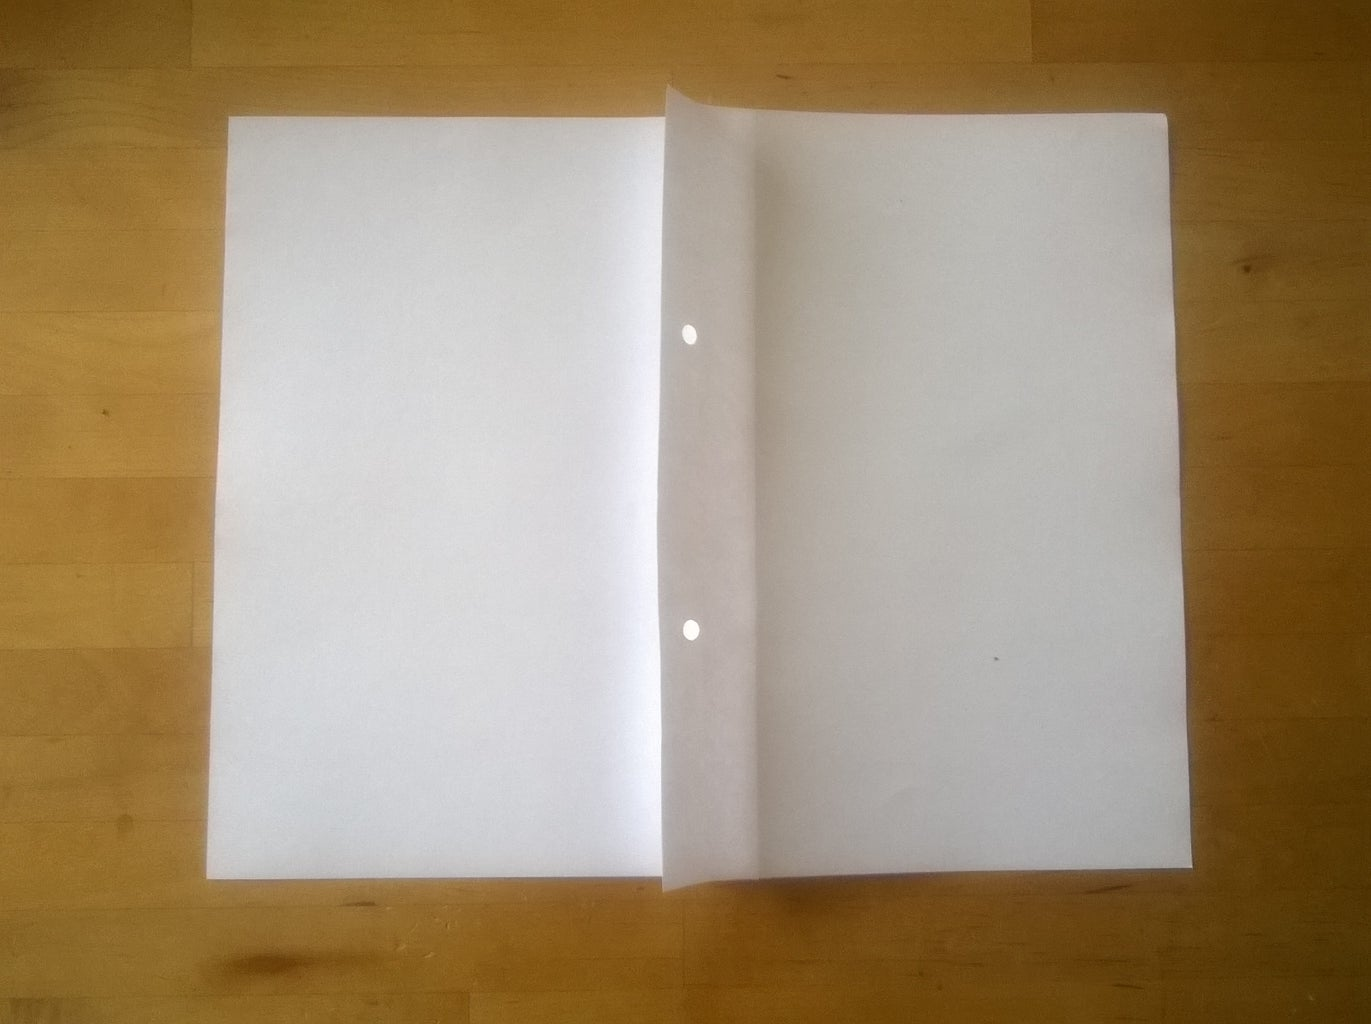 Adding Sheets